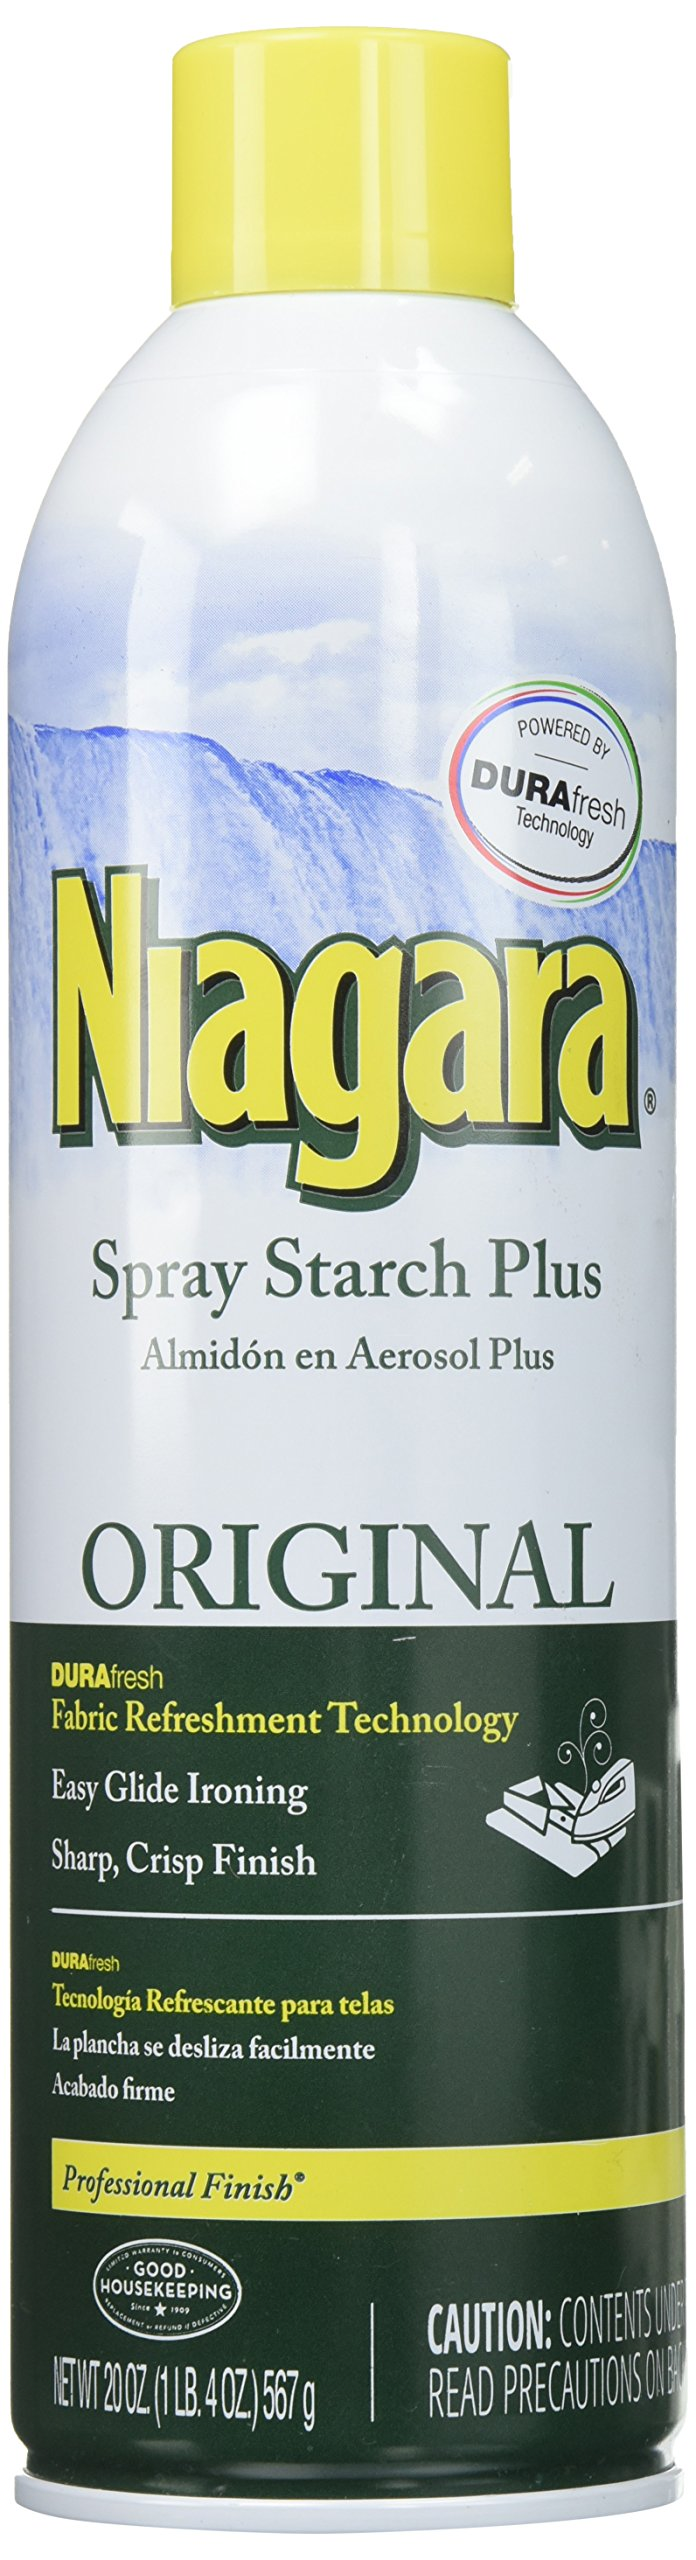 Niagara Original Spray Starch Plus Durafresh Professional Finish, 20 Oz (2 Pack)